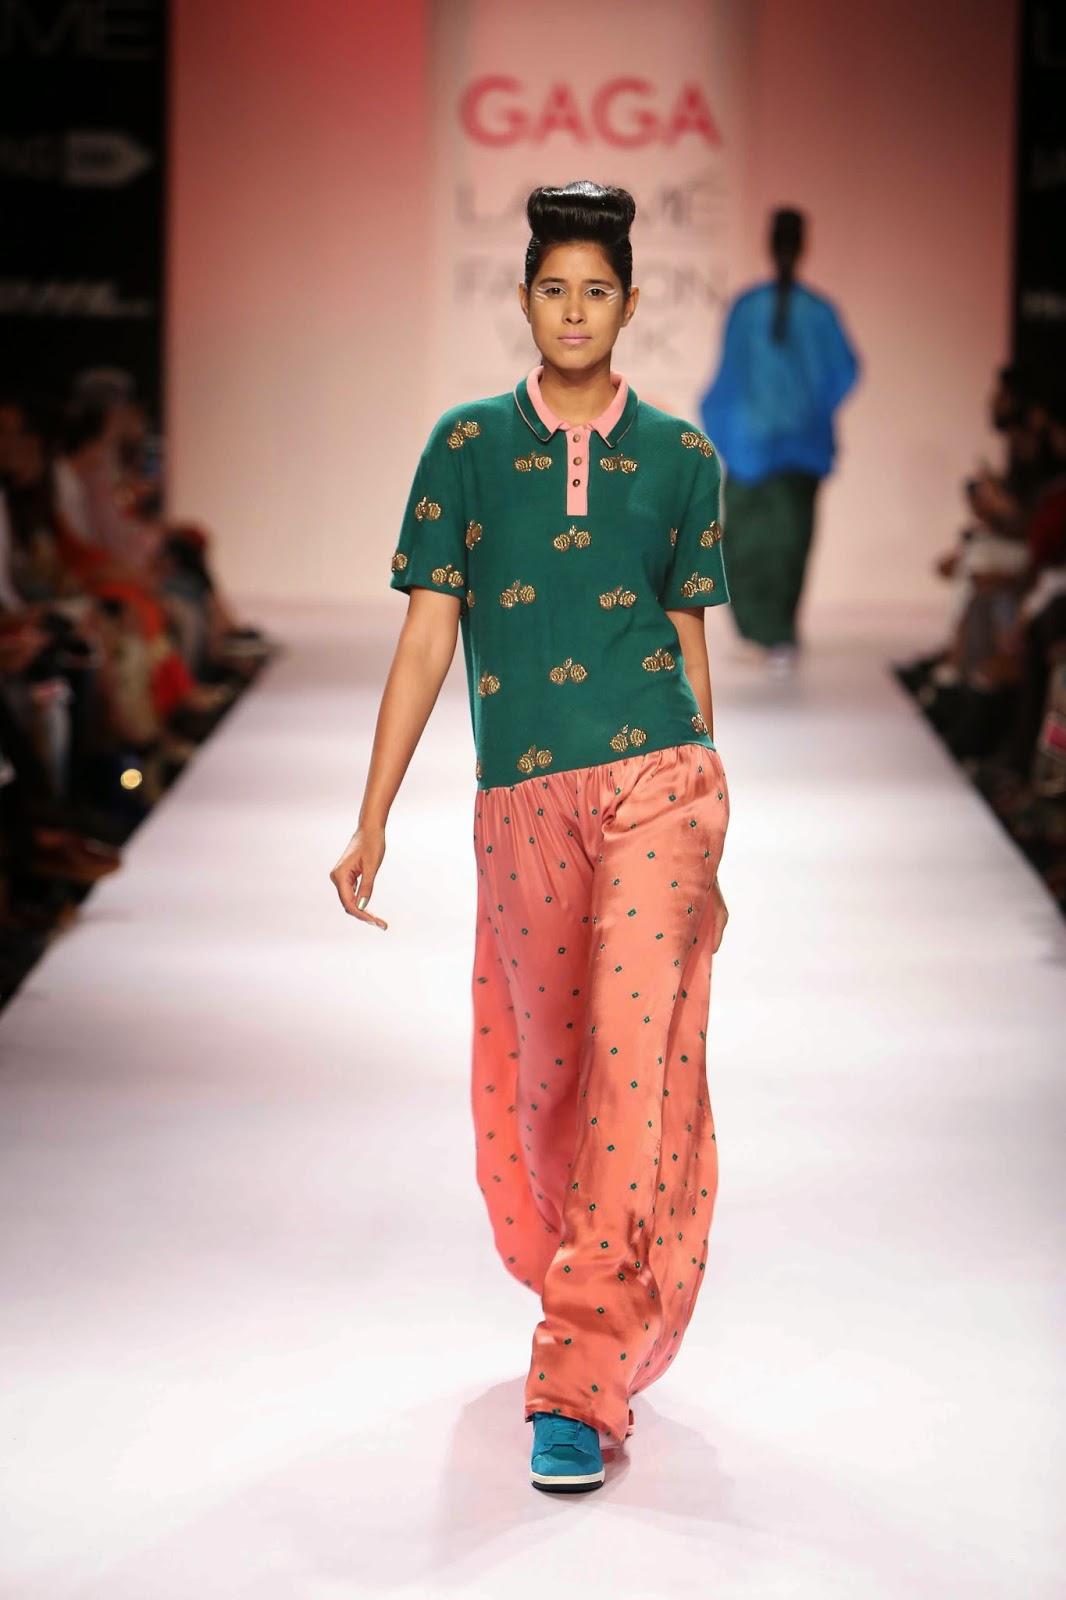 http://aquaintperspective.blogspot.in/, GAGA by Tanya Sharma